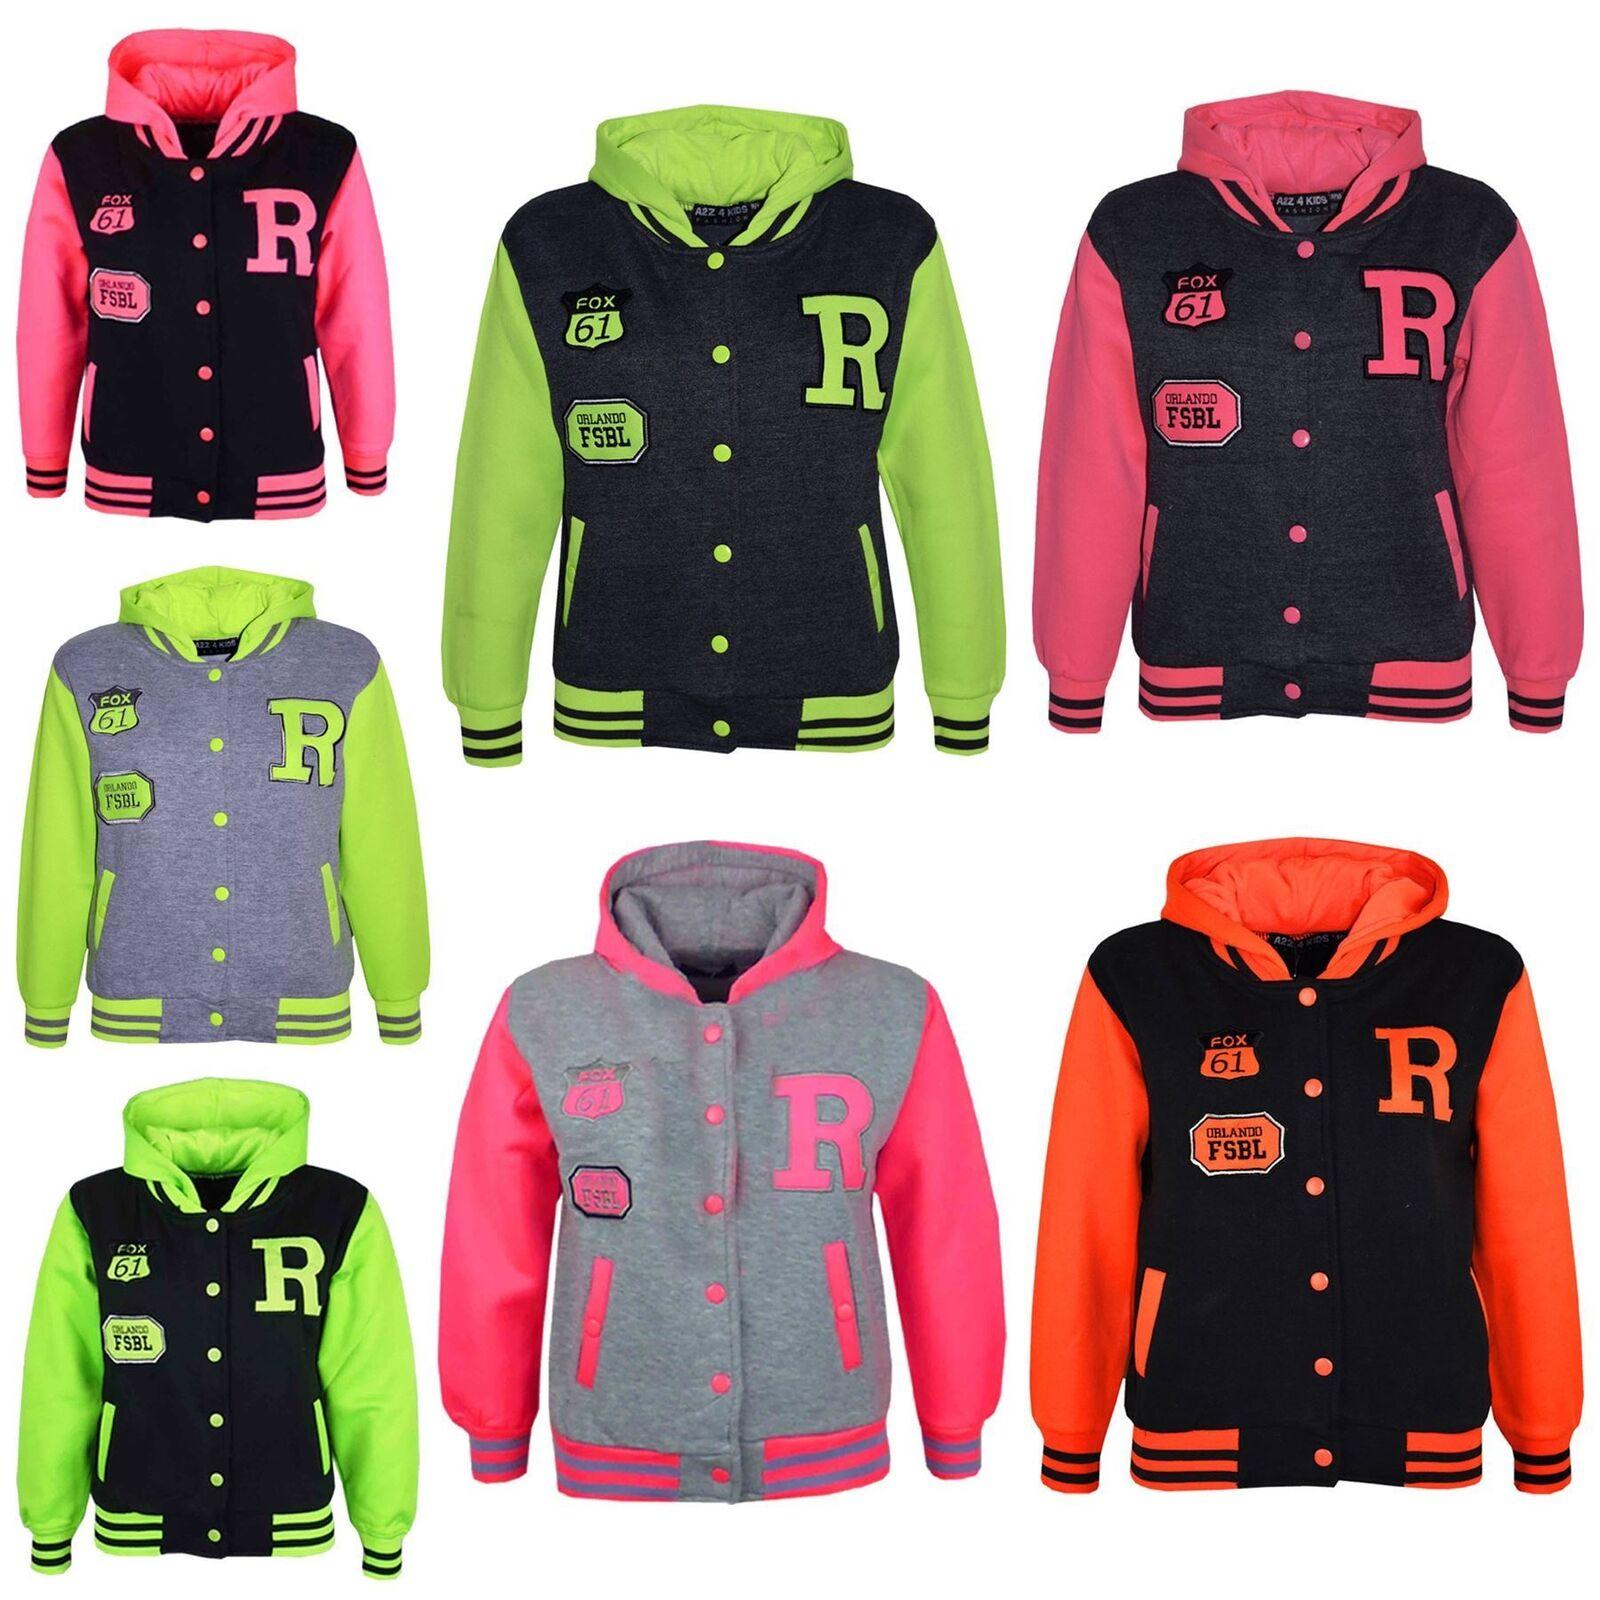 Kids Girls Boys R Fashion Baseball Grey Neon Green Hooded Jackets Varsity Hoodie